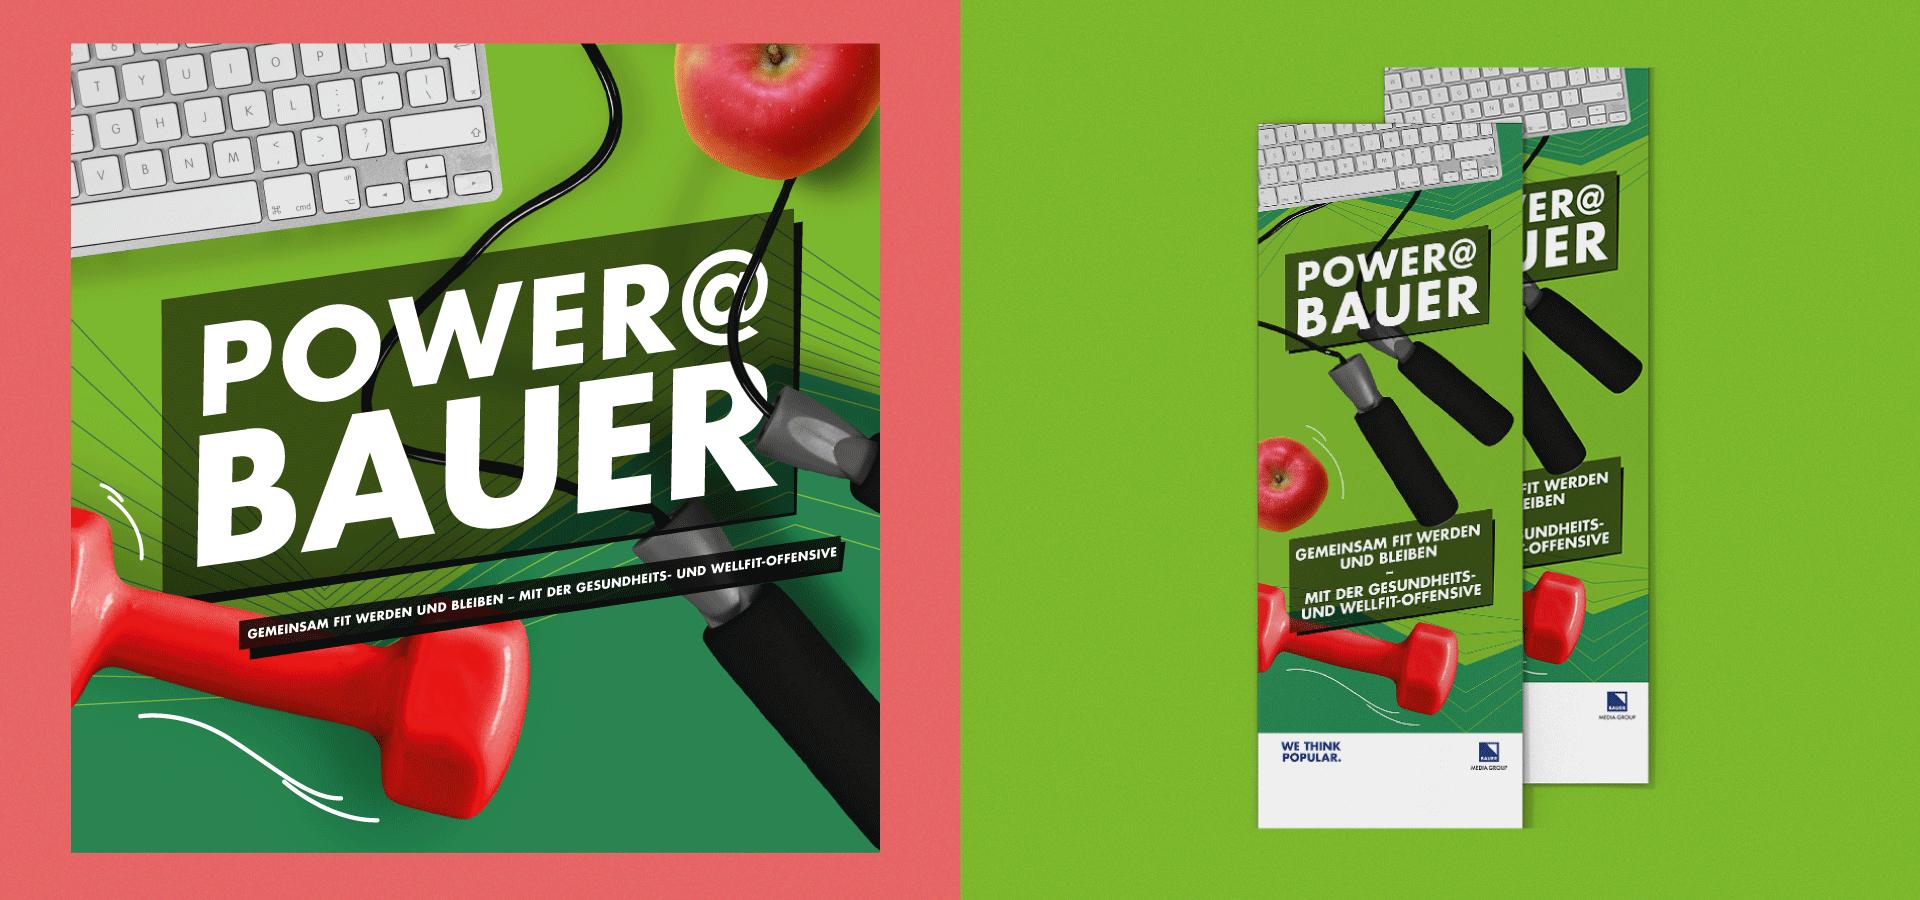 Bauer Media Group Power@Bauer Flyer